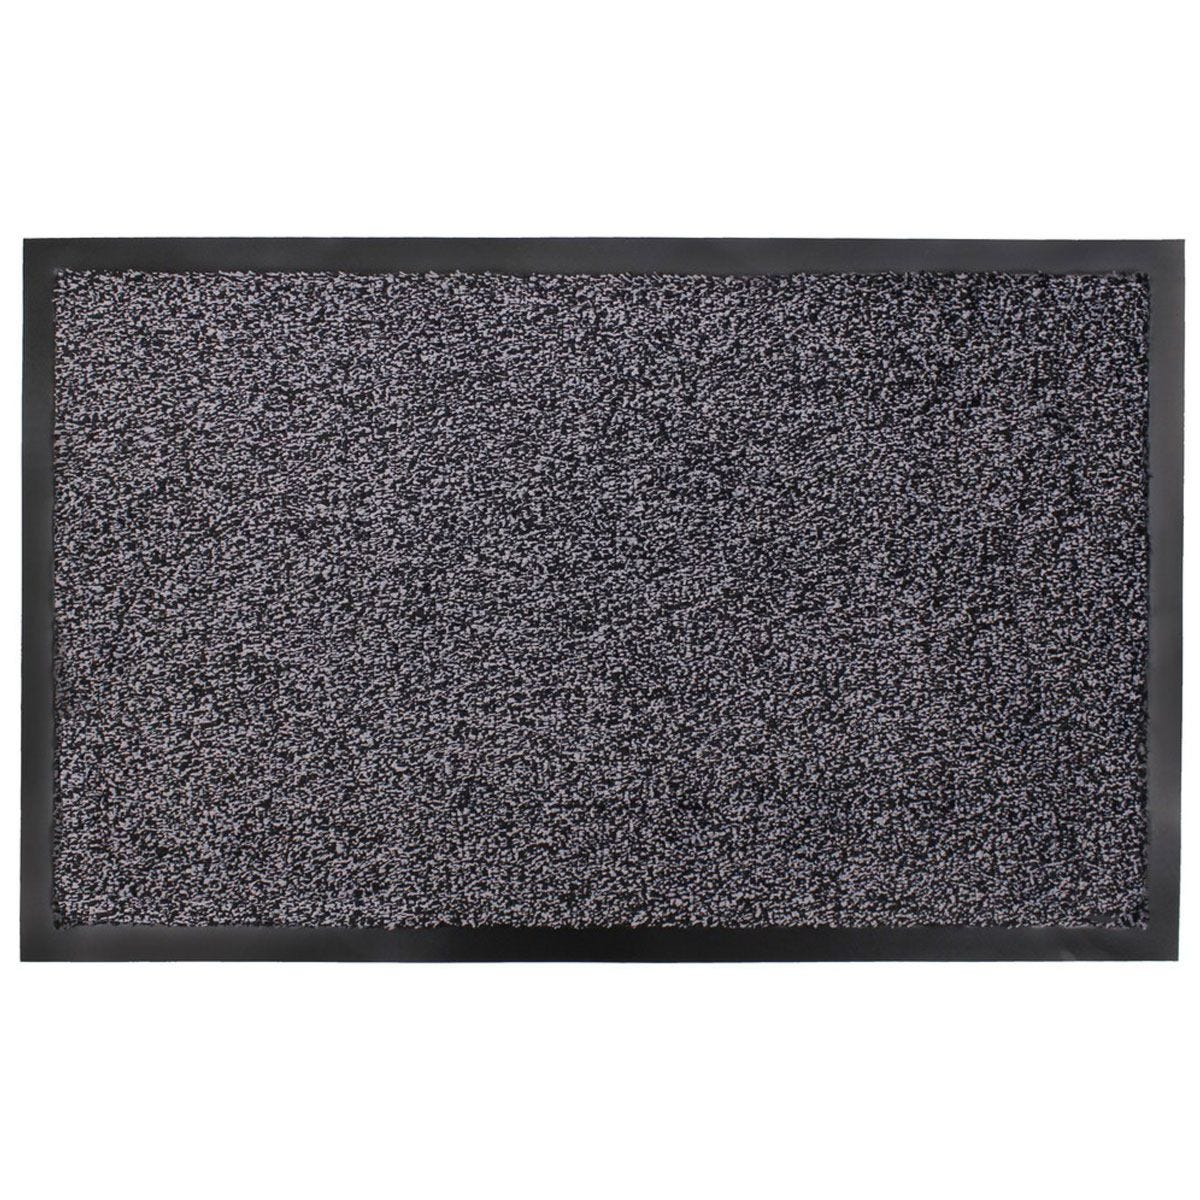 JVL Admiral Barrier Microfiber 50 x 80cm Door Mat - Charcoal